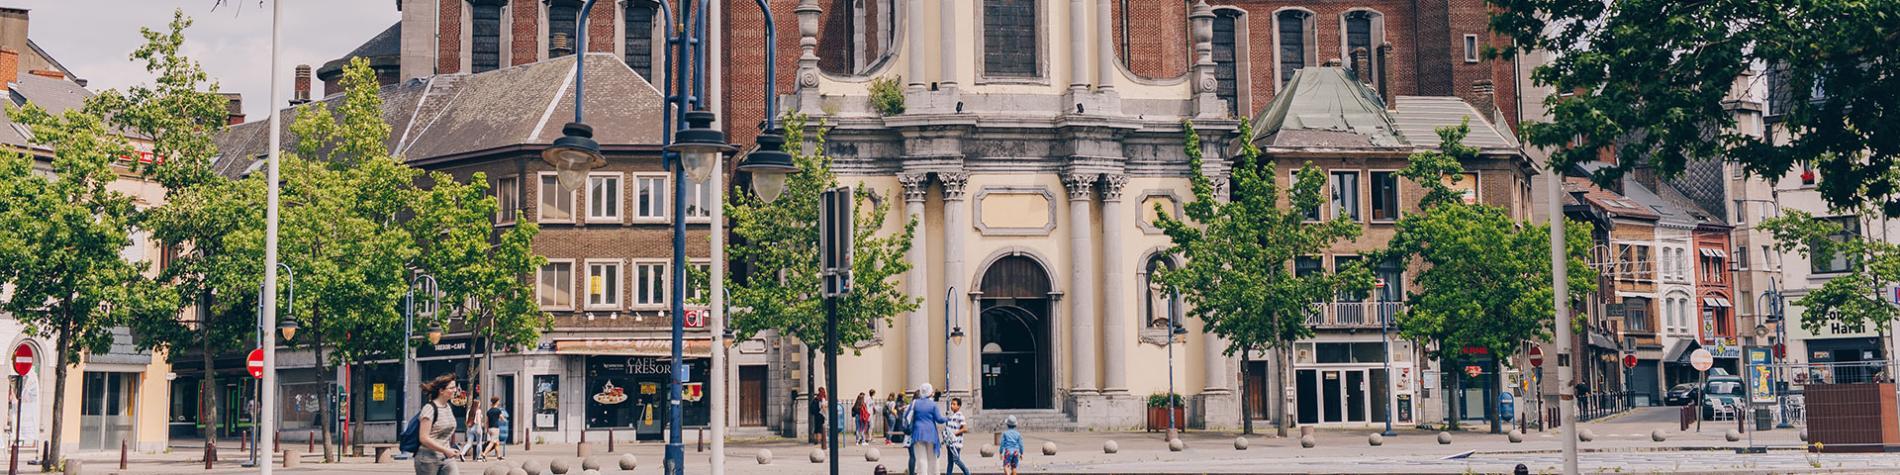 Eglise - Saint-Christophe - Charleroi